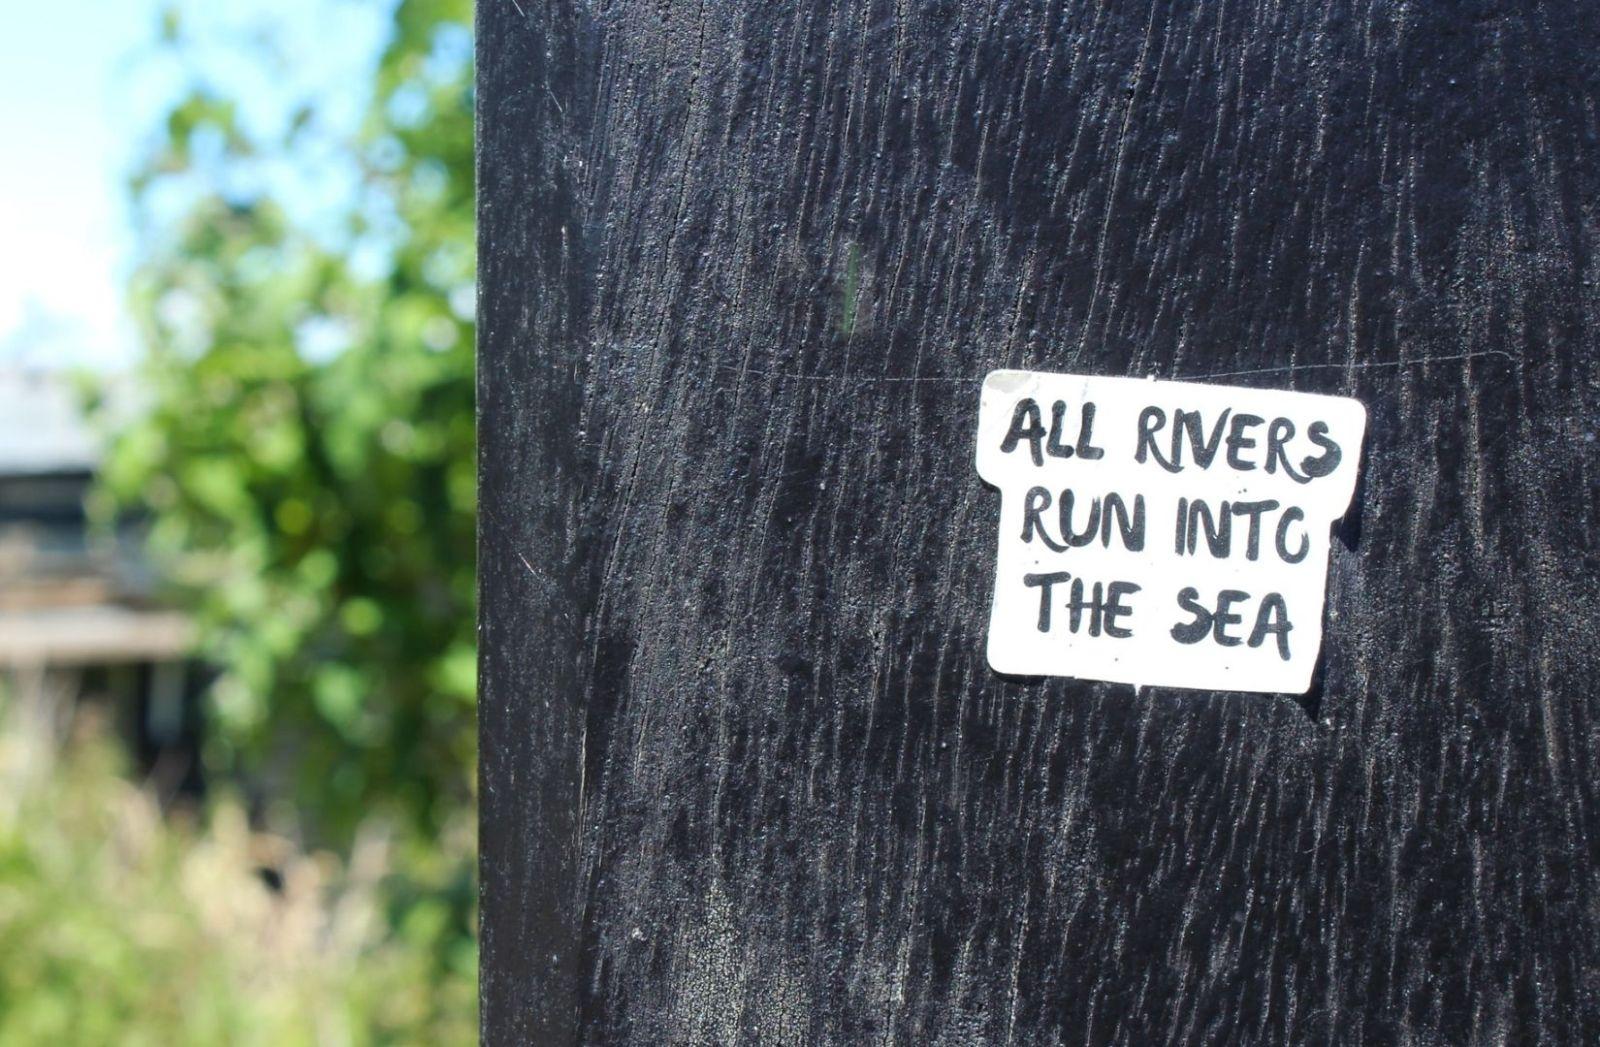 All Rivers run into the Sea. (Foto: Tamar, Unsplash.com)